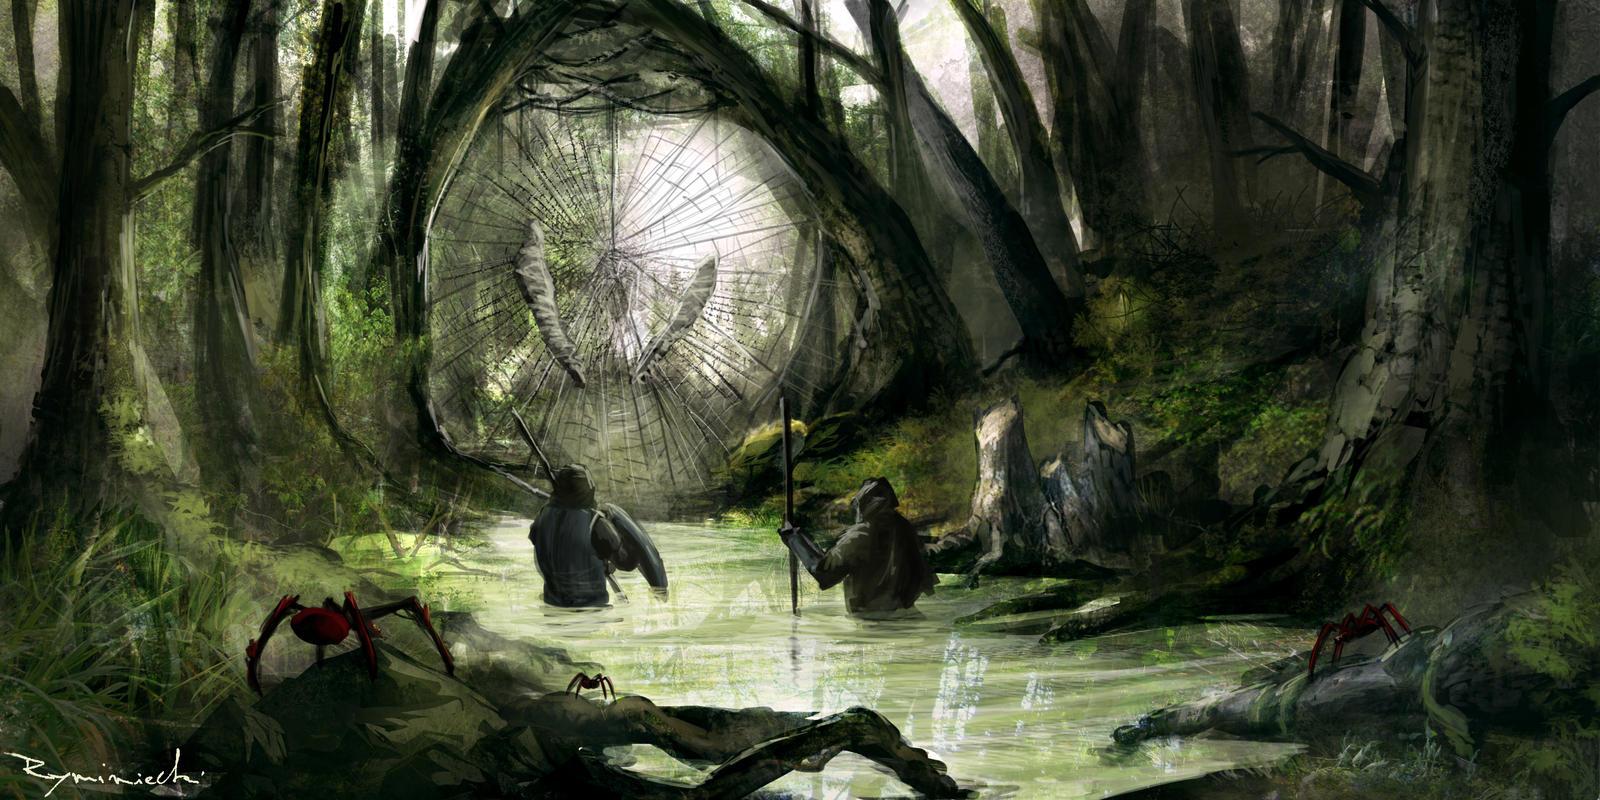 Swamp by rymin07